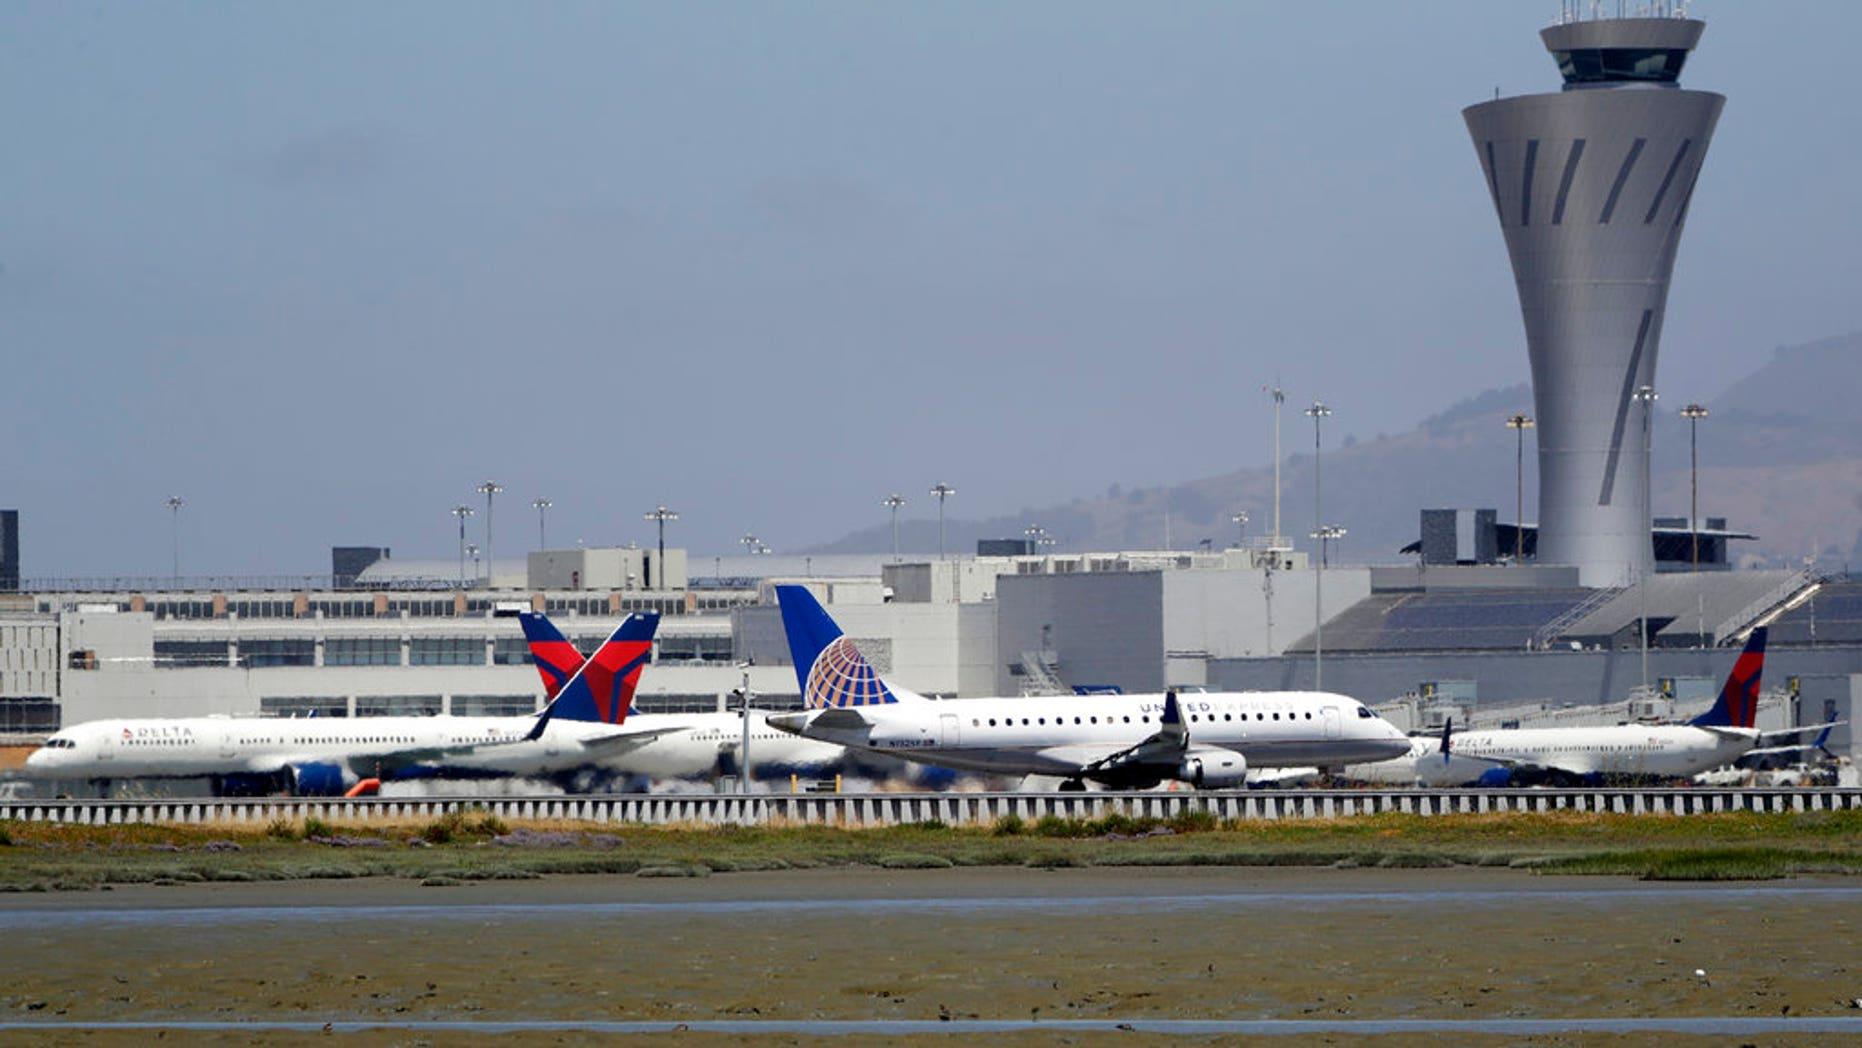 July 11, 2017: Departing and parked aircraft intersect at San Francisco International Airport.